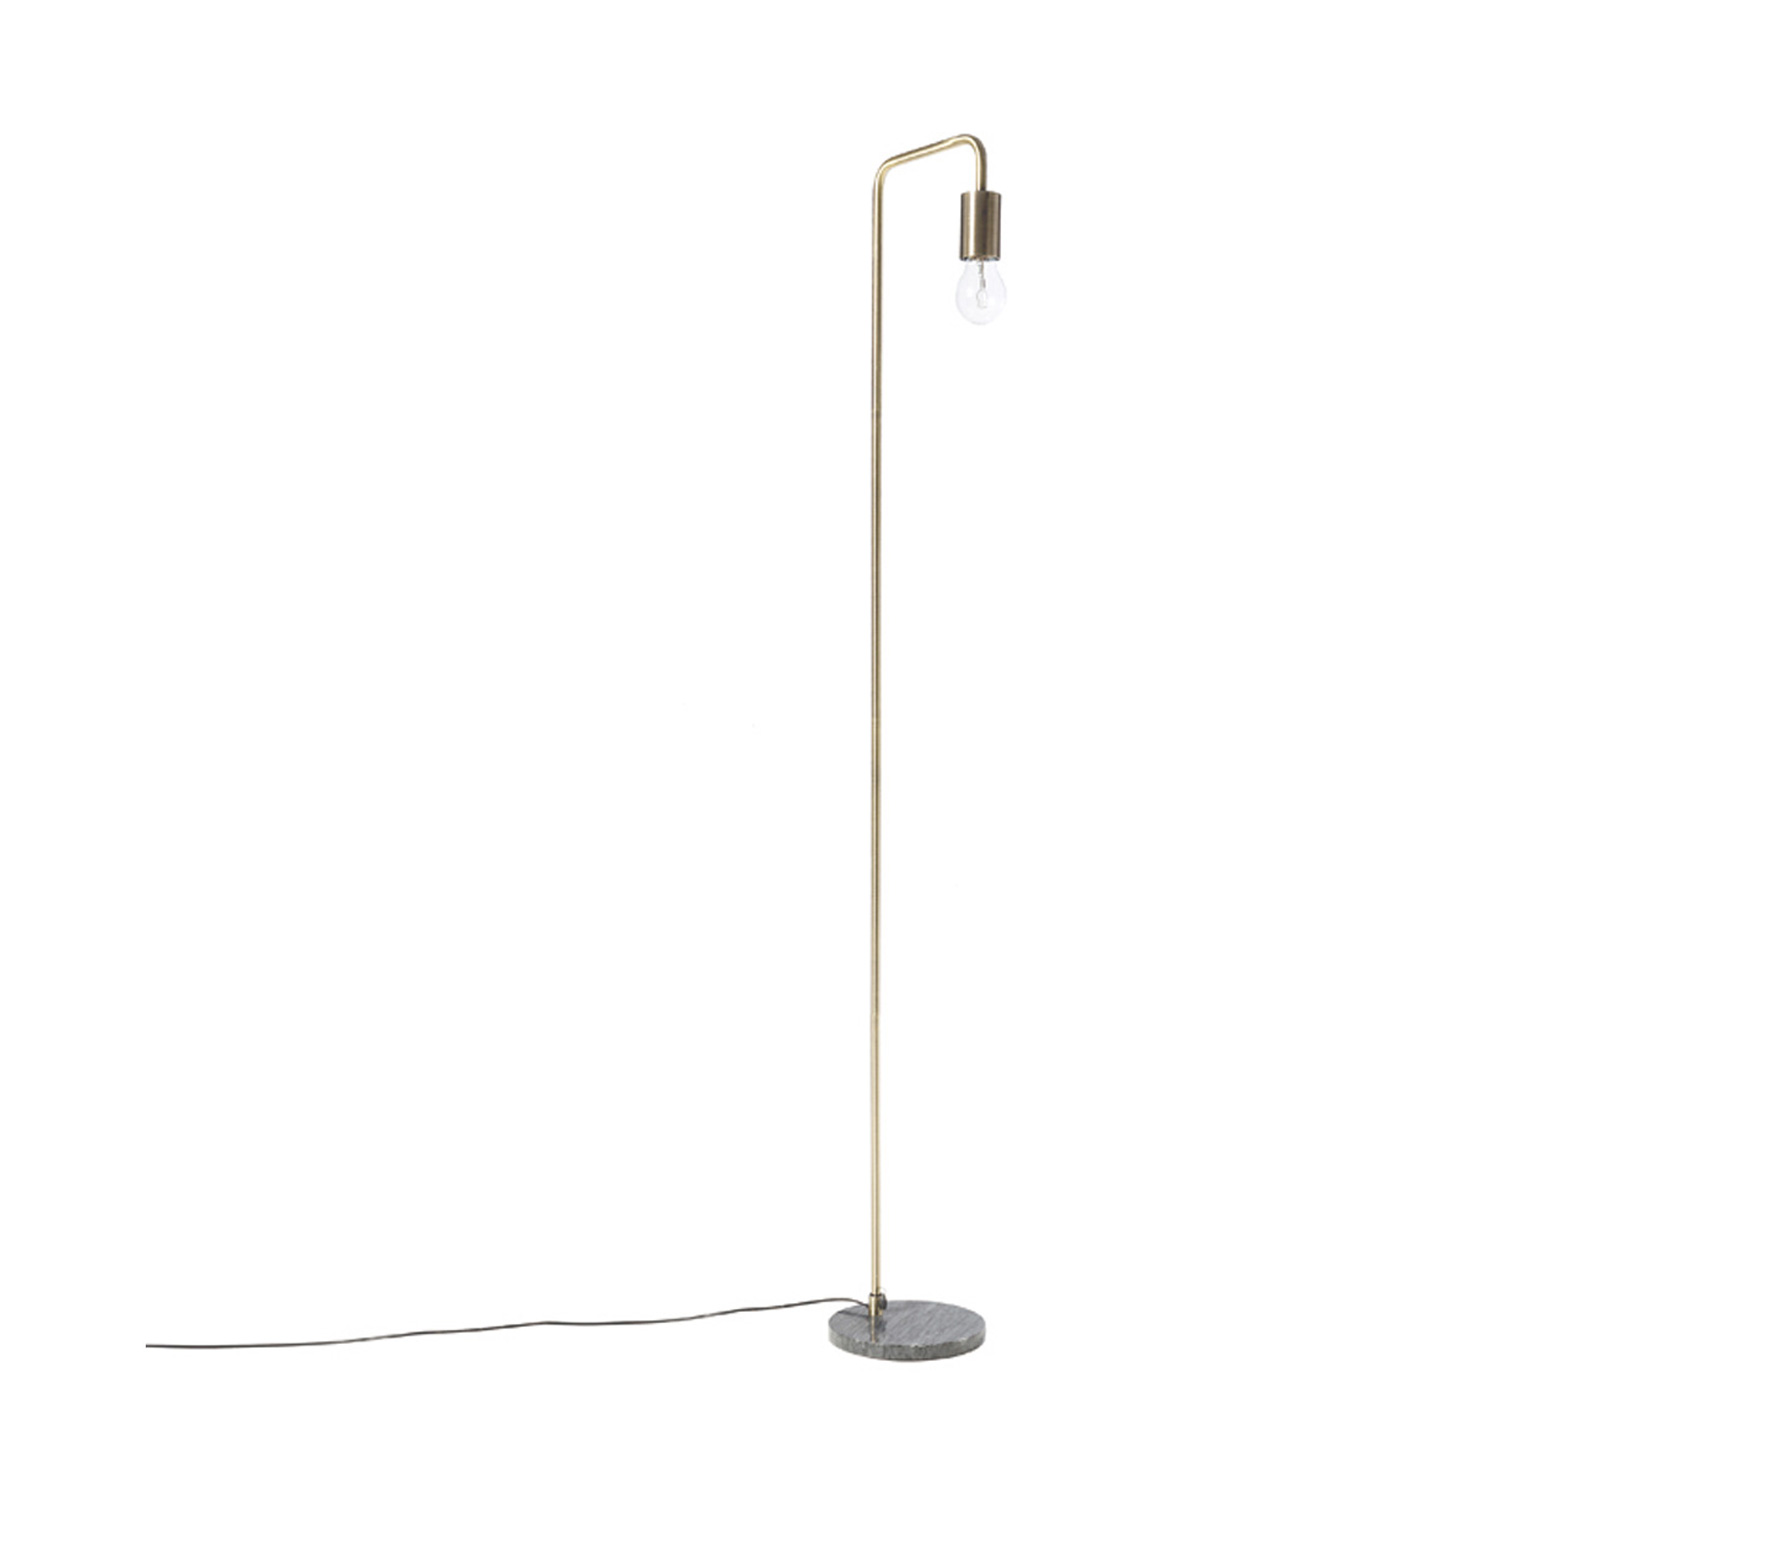 Riverdale staande lamp Marble donkergrijs 138 cm